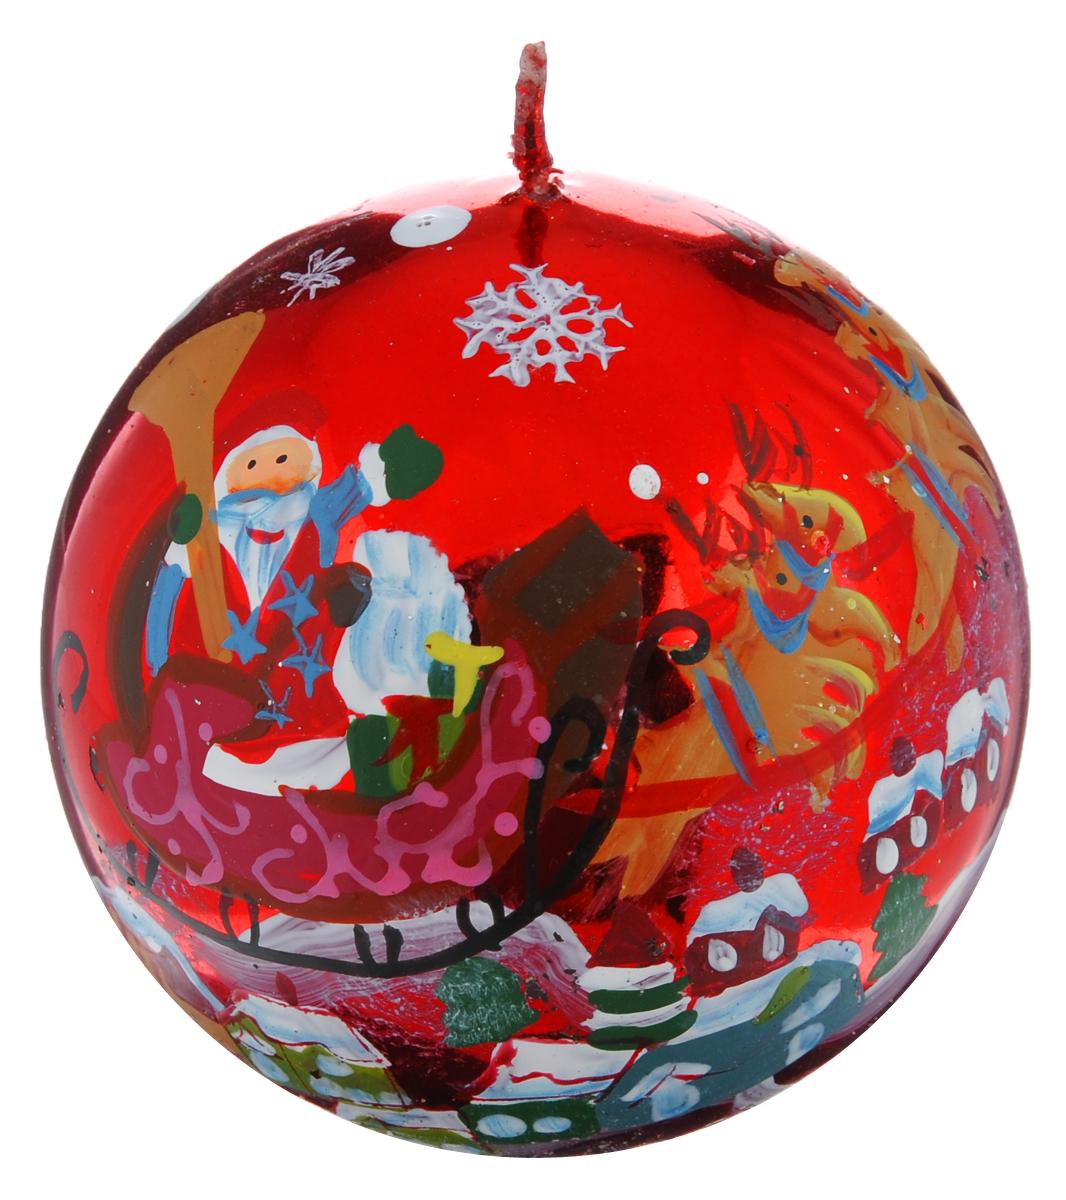 Свеча-шар Winter Wings Дед Мороз, диаметр 7,3 см наклейка winter wings панно дед мороз и дети 29 5х40 см n09277